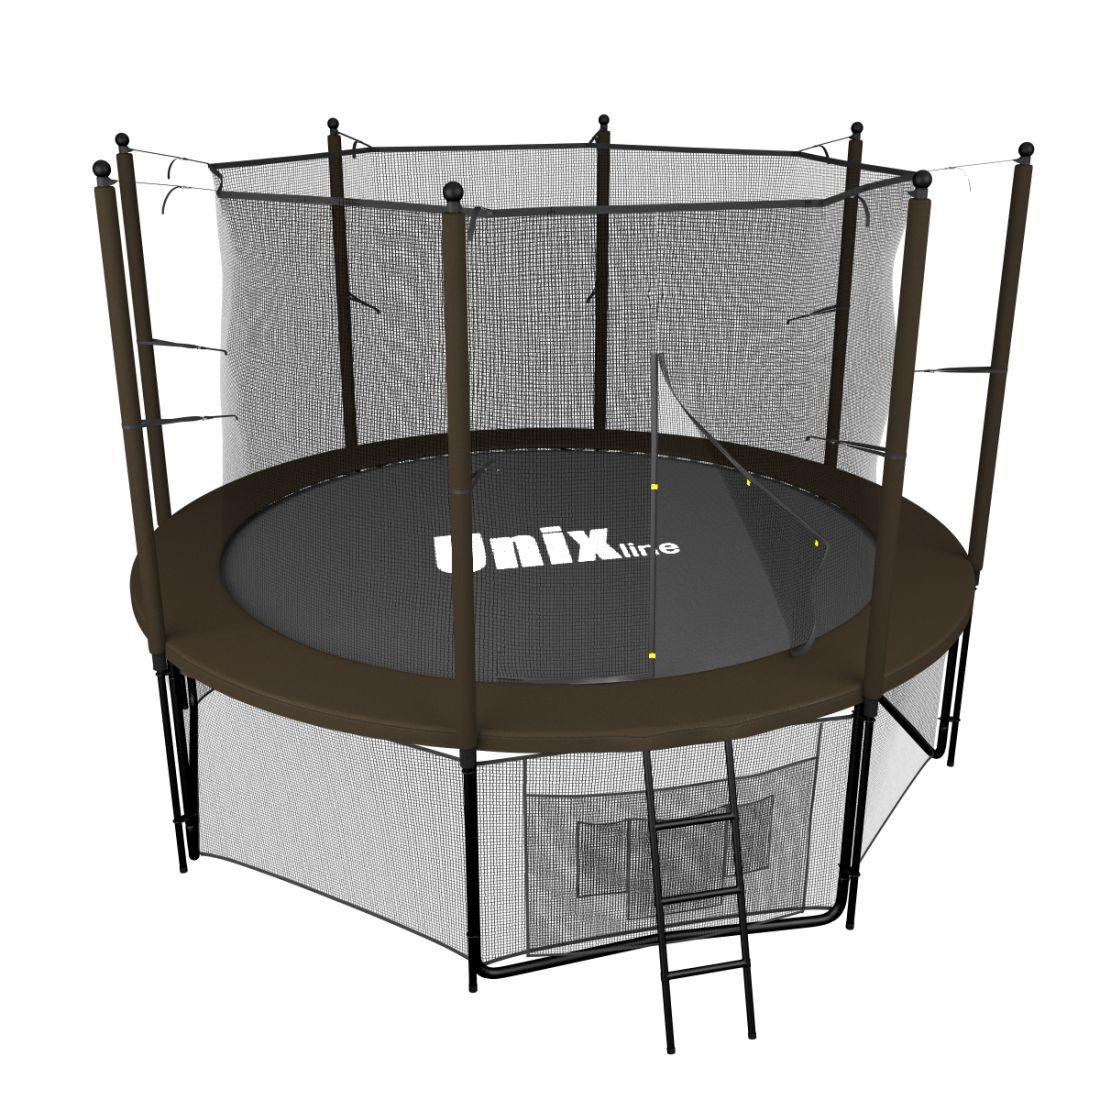 Батут UNIX line 8 ft (2.44 м, до 150 кг) Black&Brown (inside)